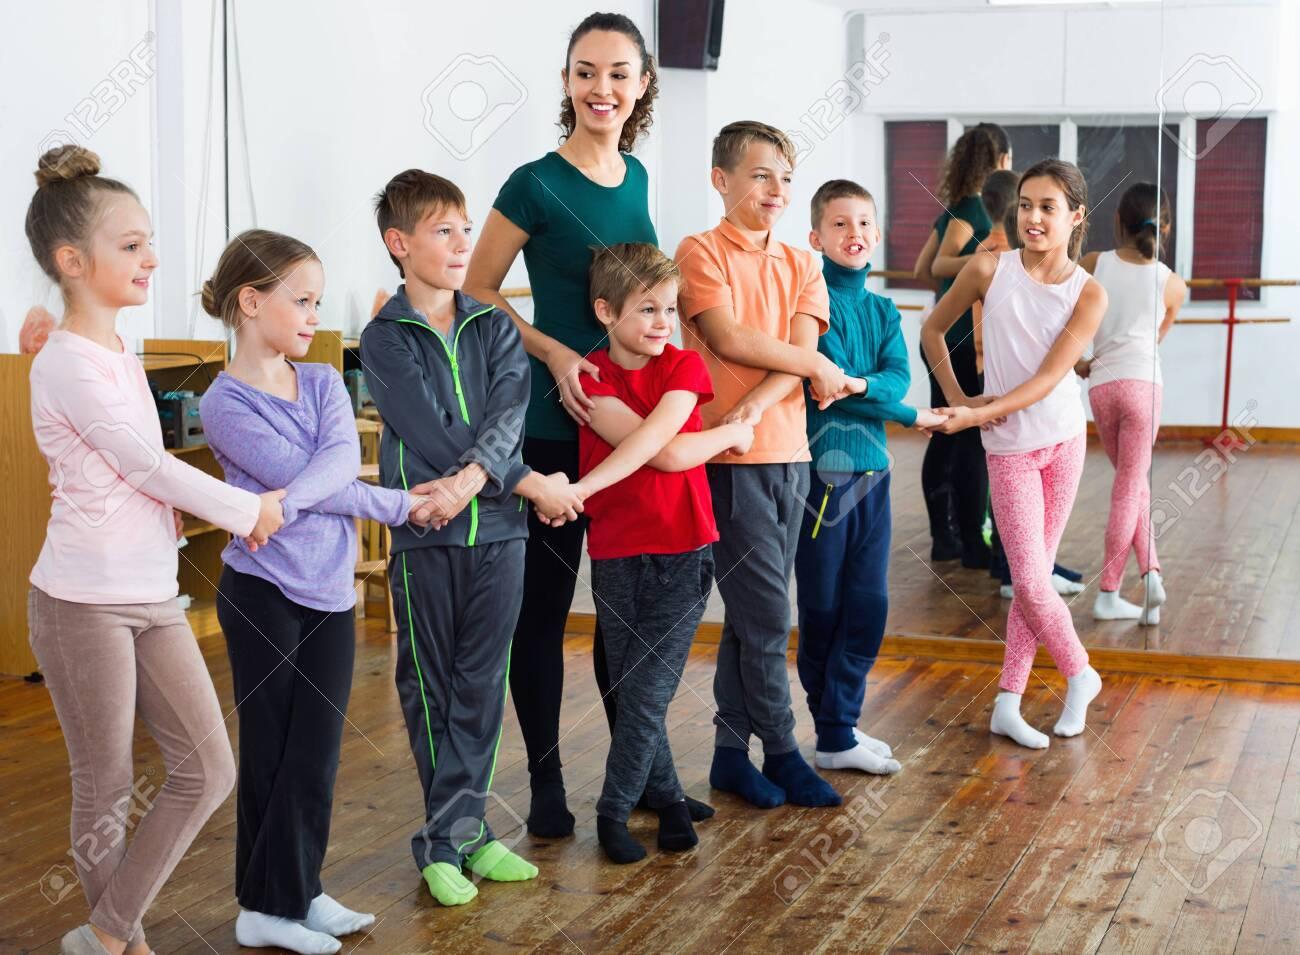 Happy positive children dancing folk dance in studio smiling and having fun - 124461037